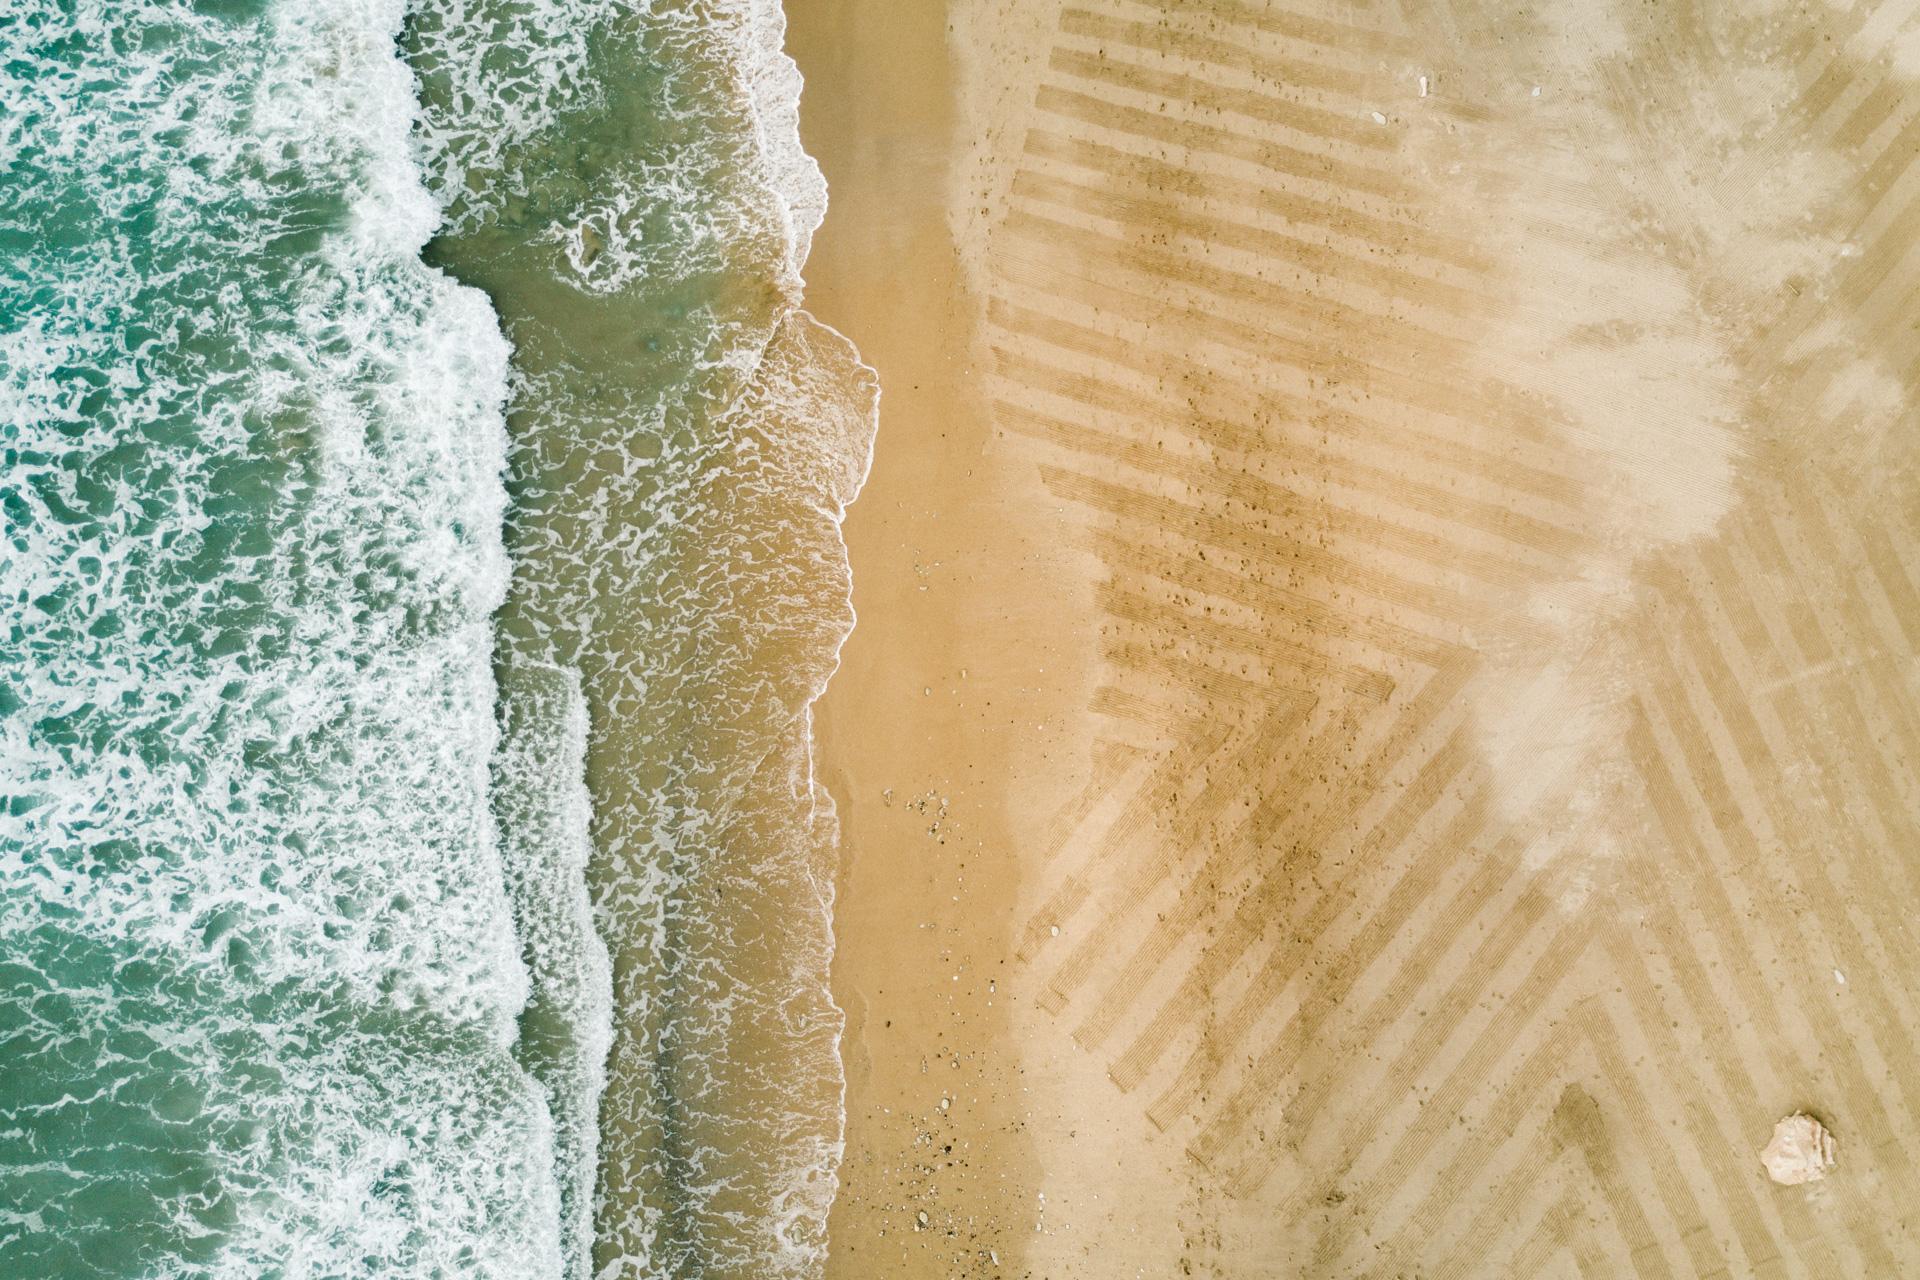 Damien-dohmen-sand-print-lx-one-34